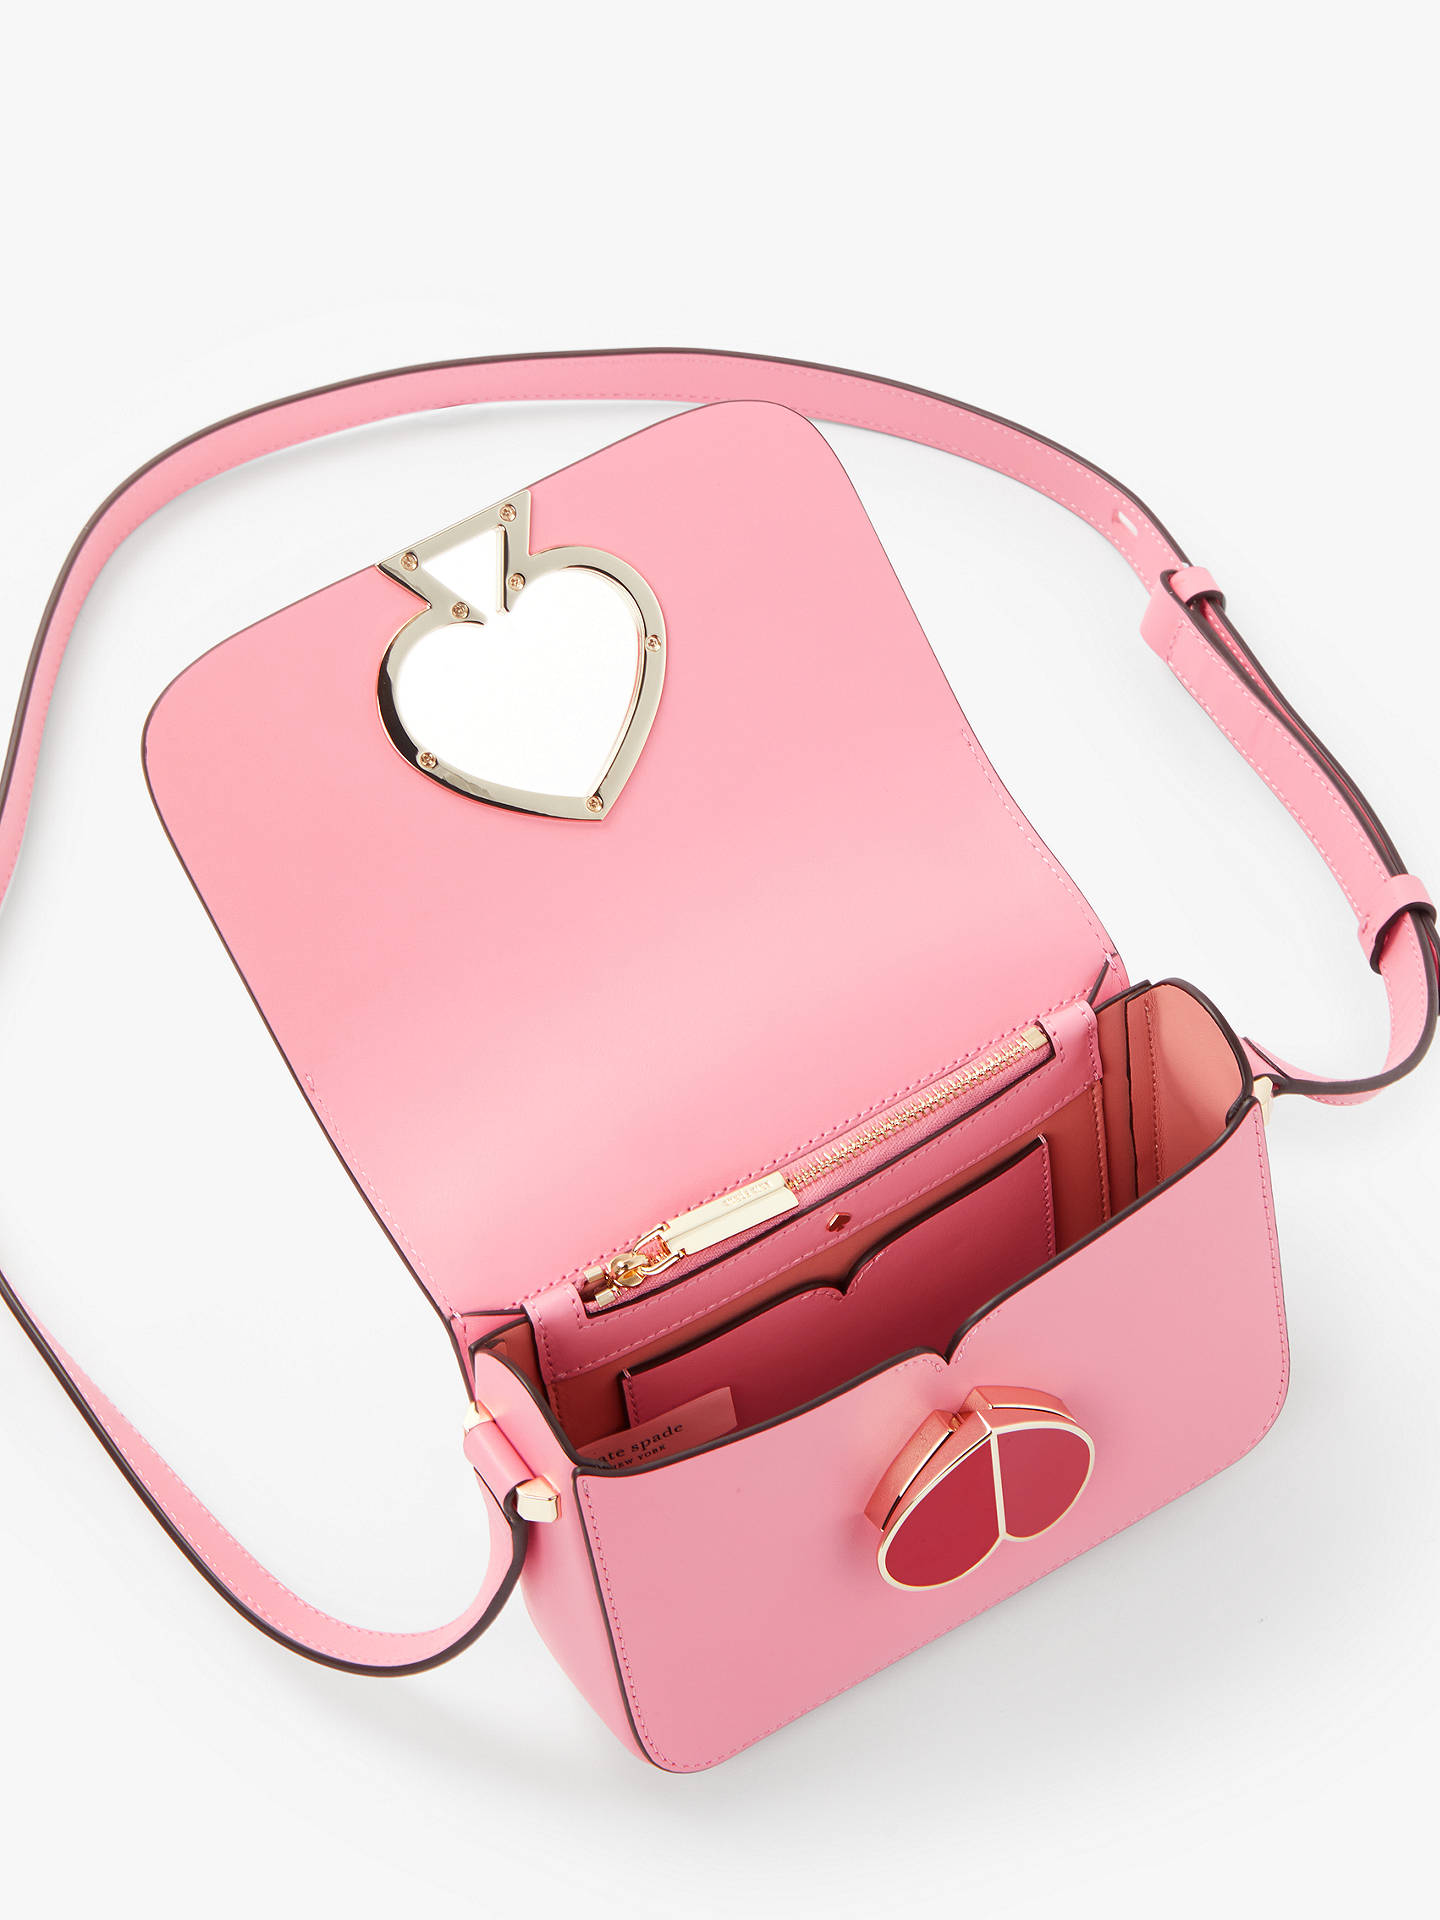 0c2495f9378057 ... Buy kate spade new york Nicola Leather Twistlock Flap Over Small  Shoulder Bag, Rococo Pink ...